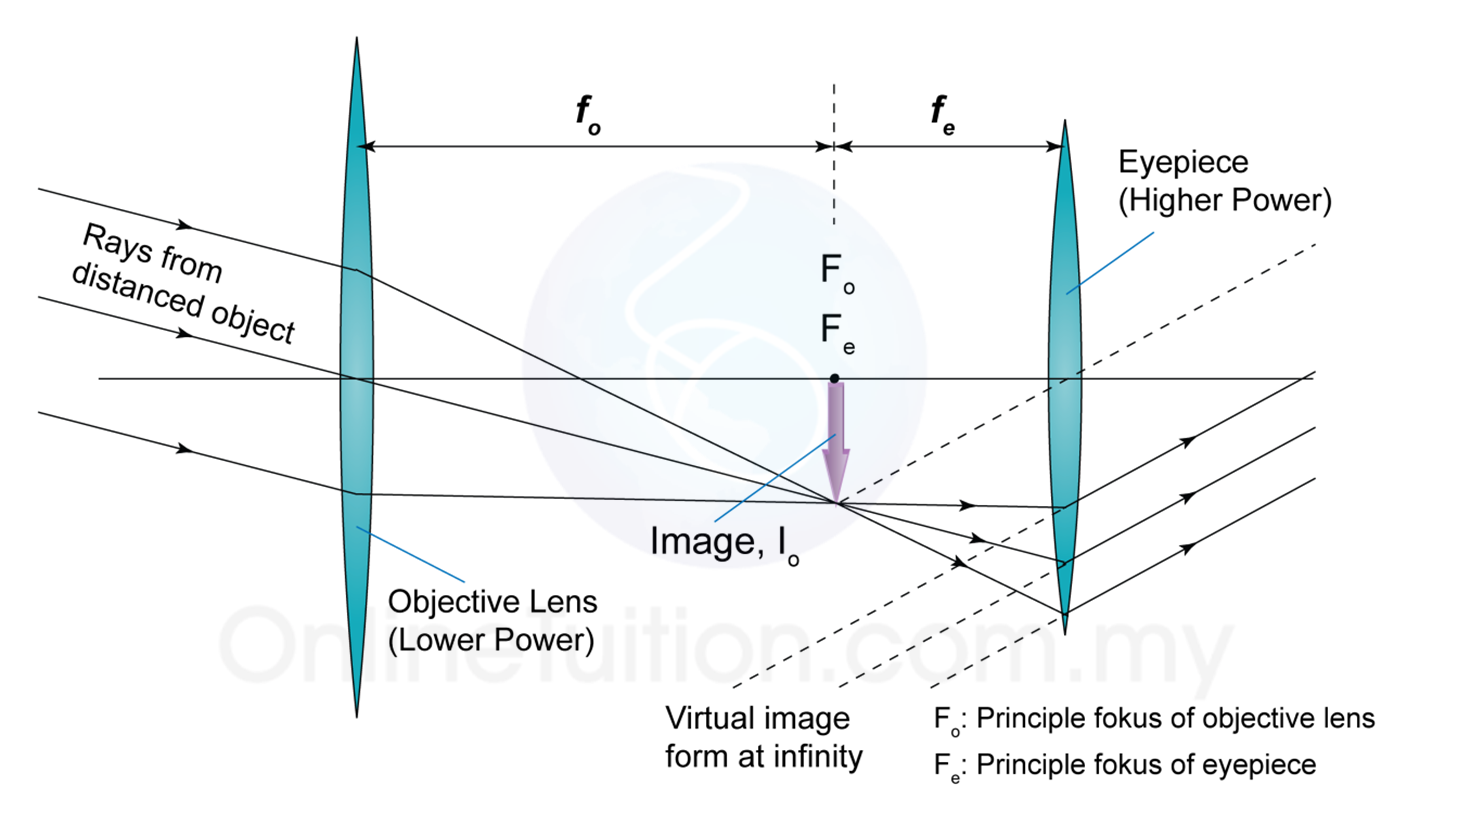 telescope optics ray diagram mk4 jetta starter wiring optical instruments astronomical spm physics